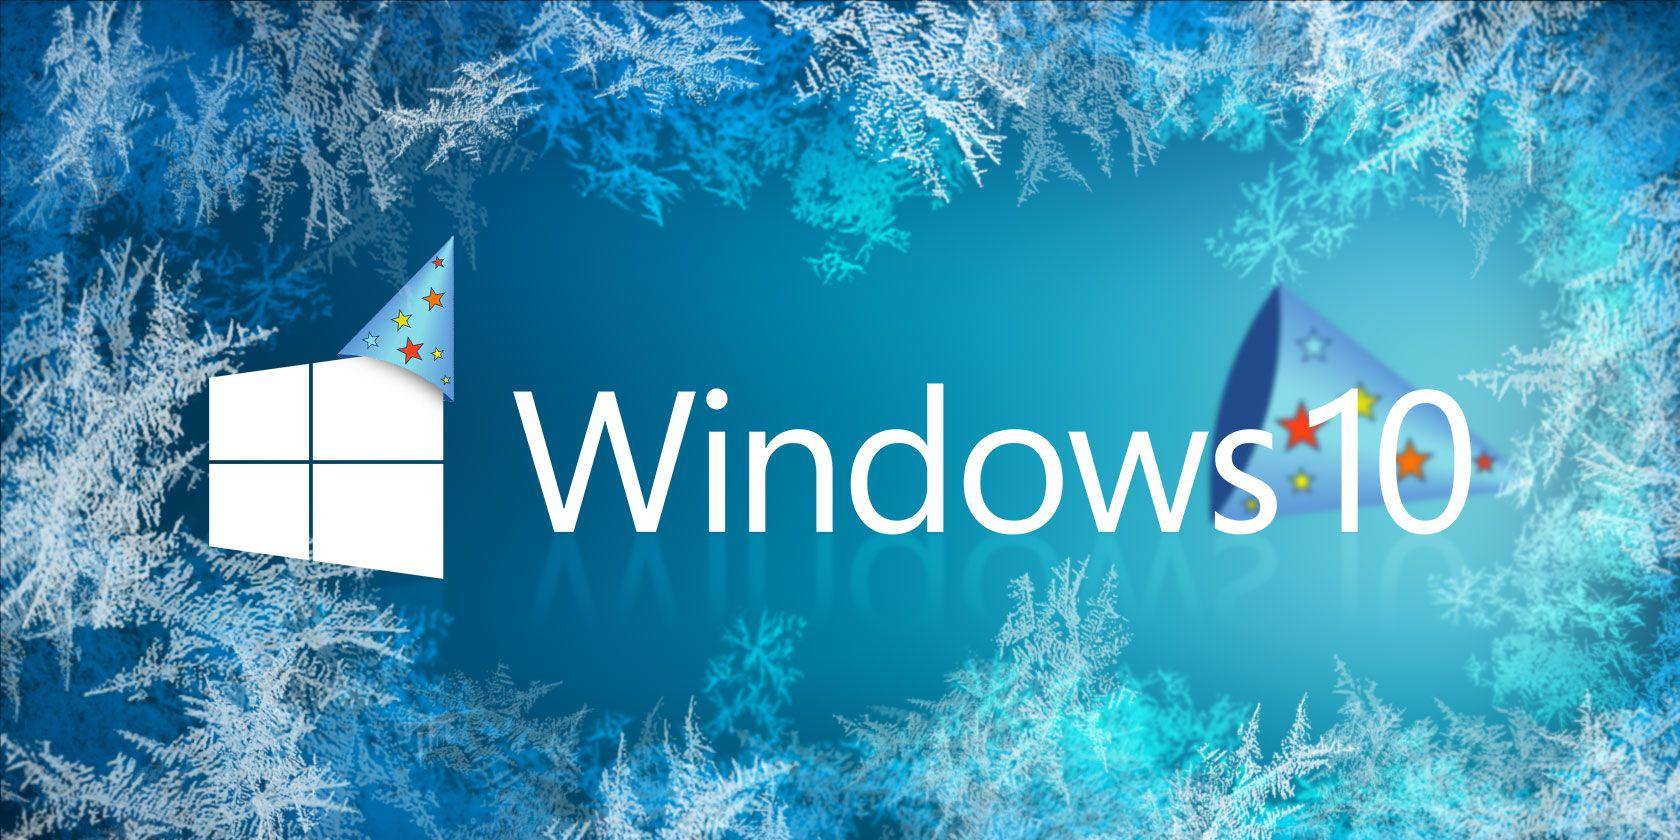 windows-10-update-freeze